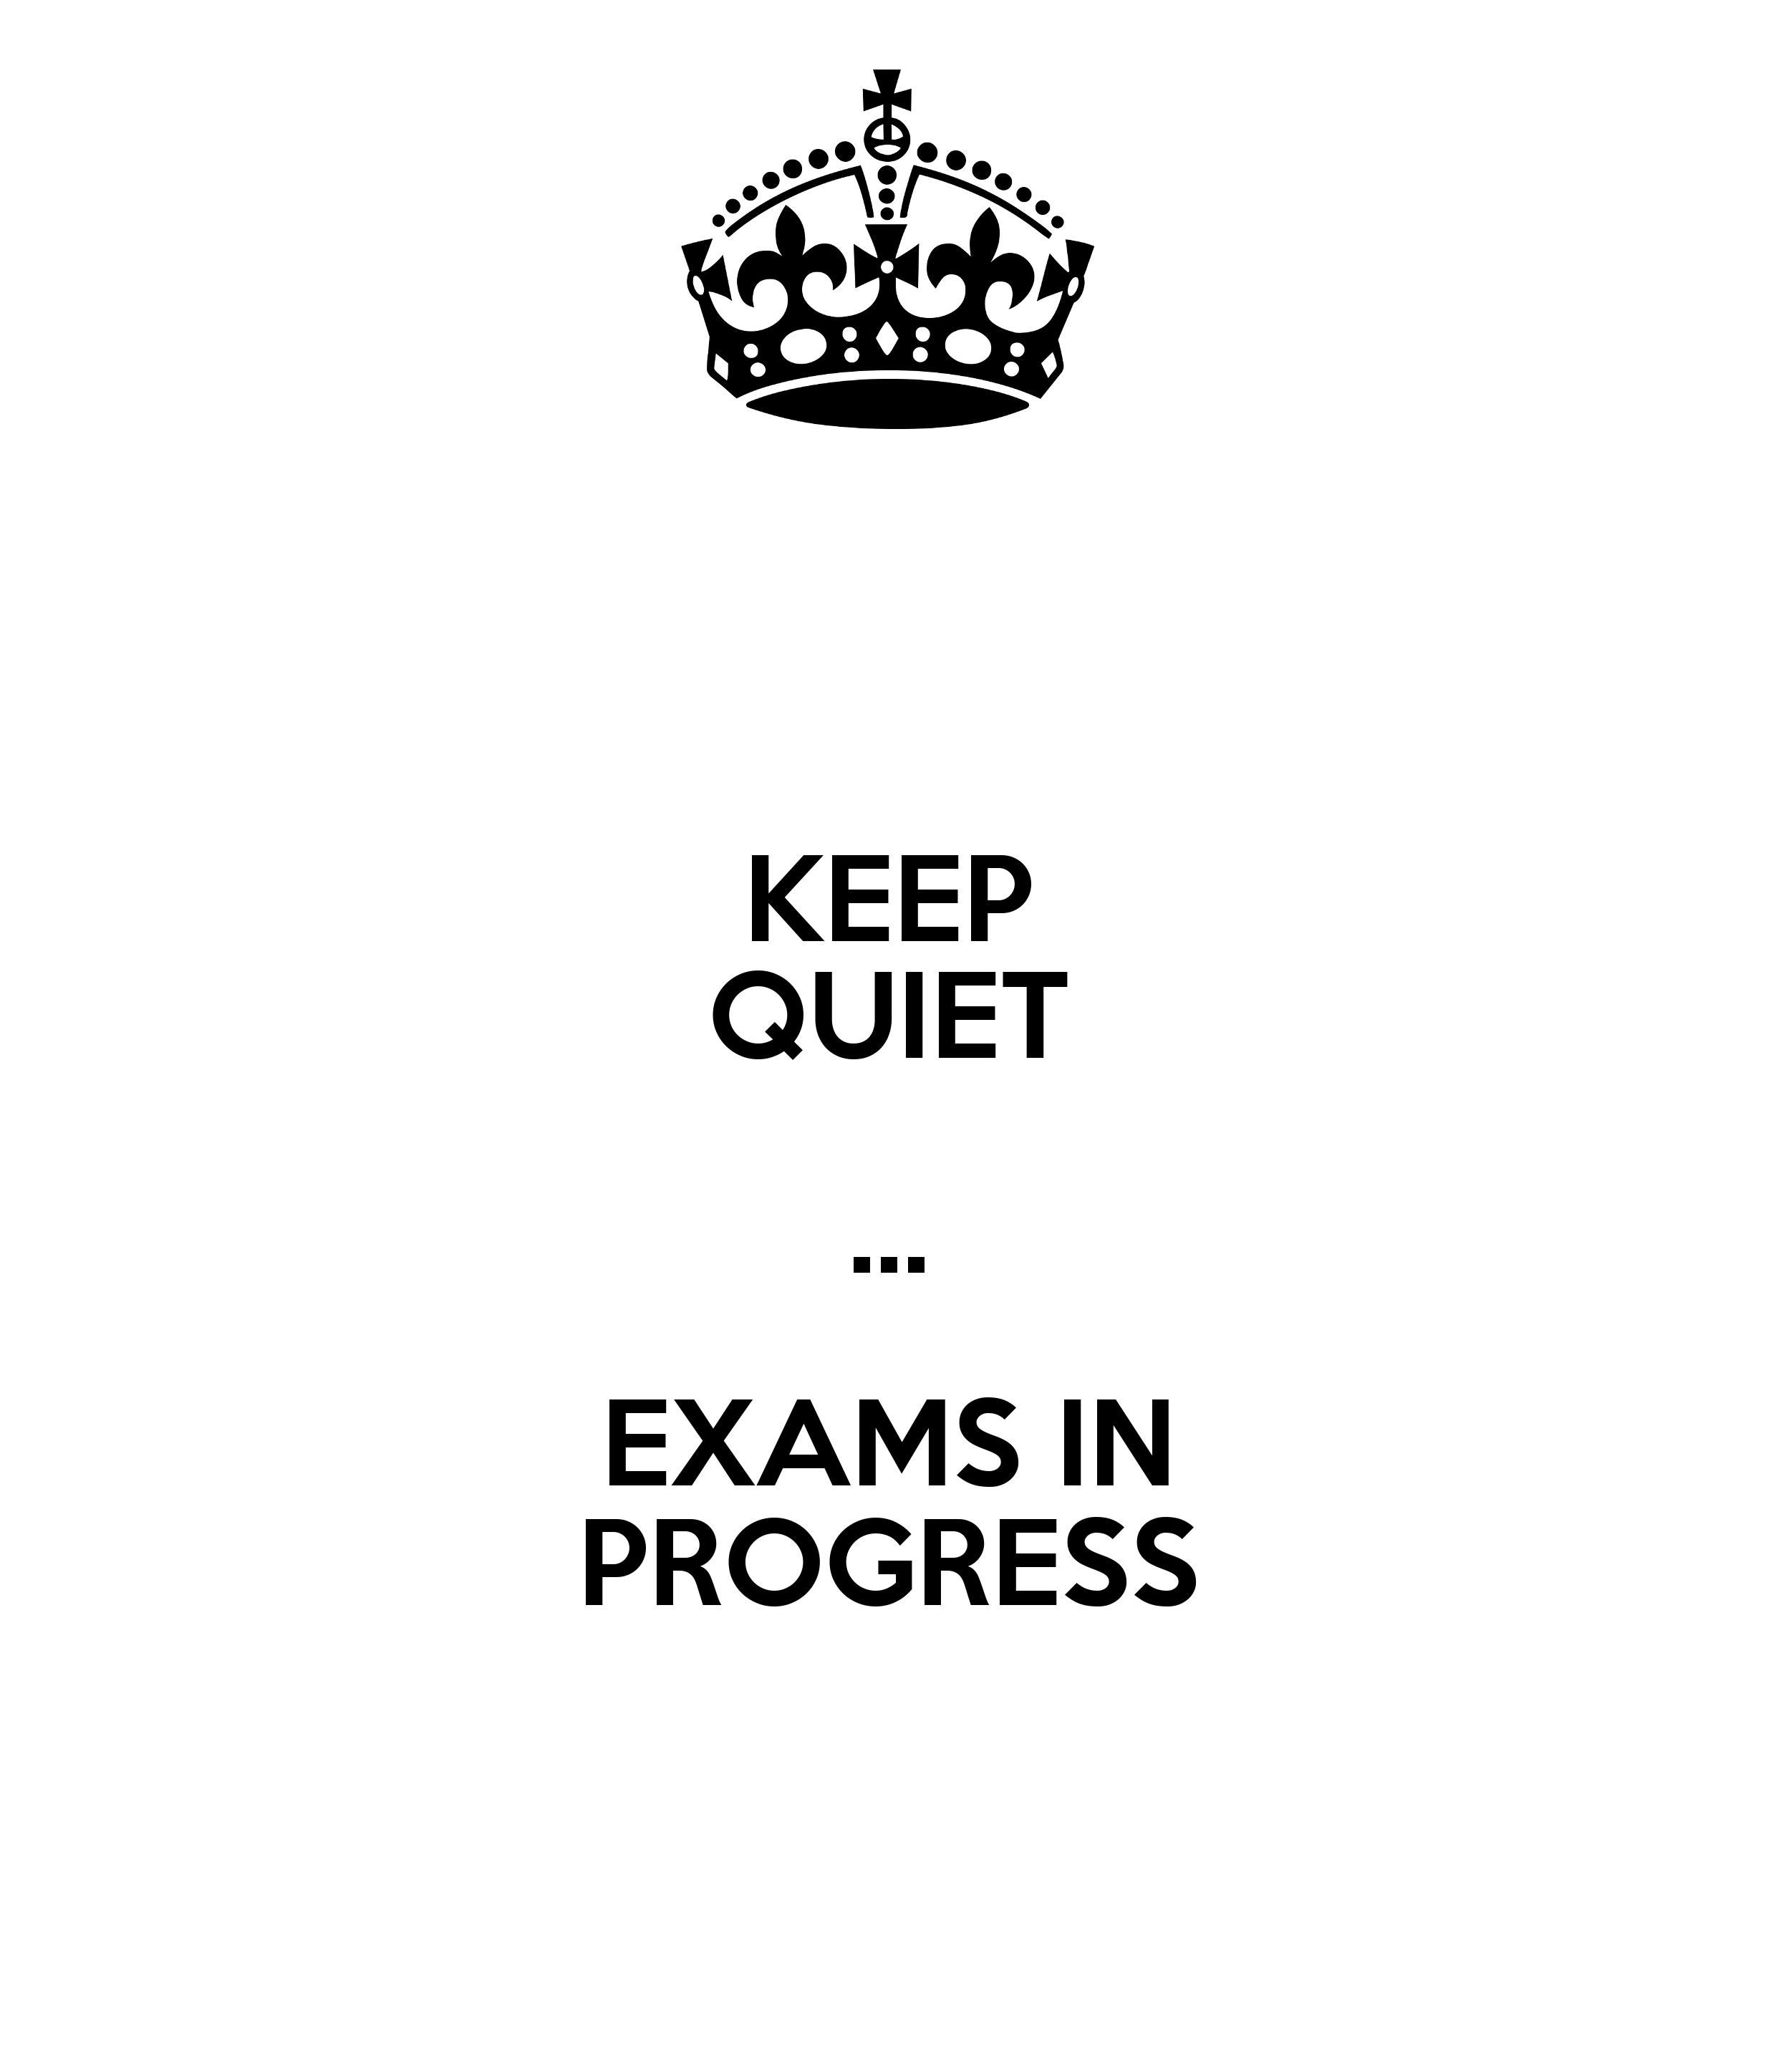 Exam in Progress Exams in Progress